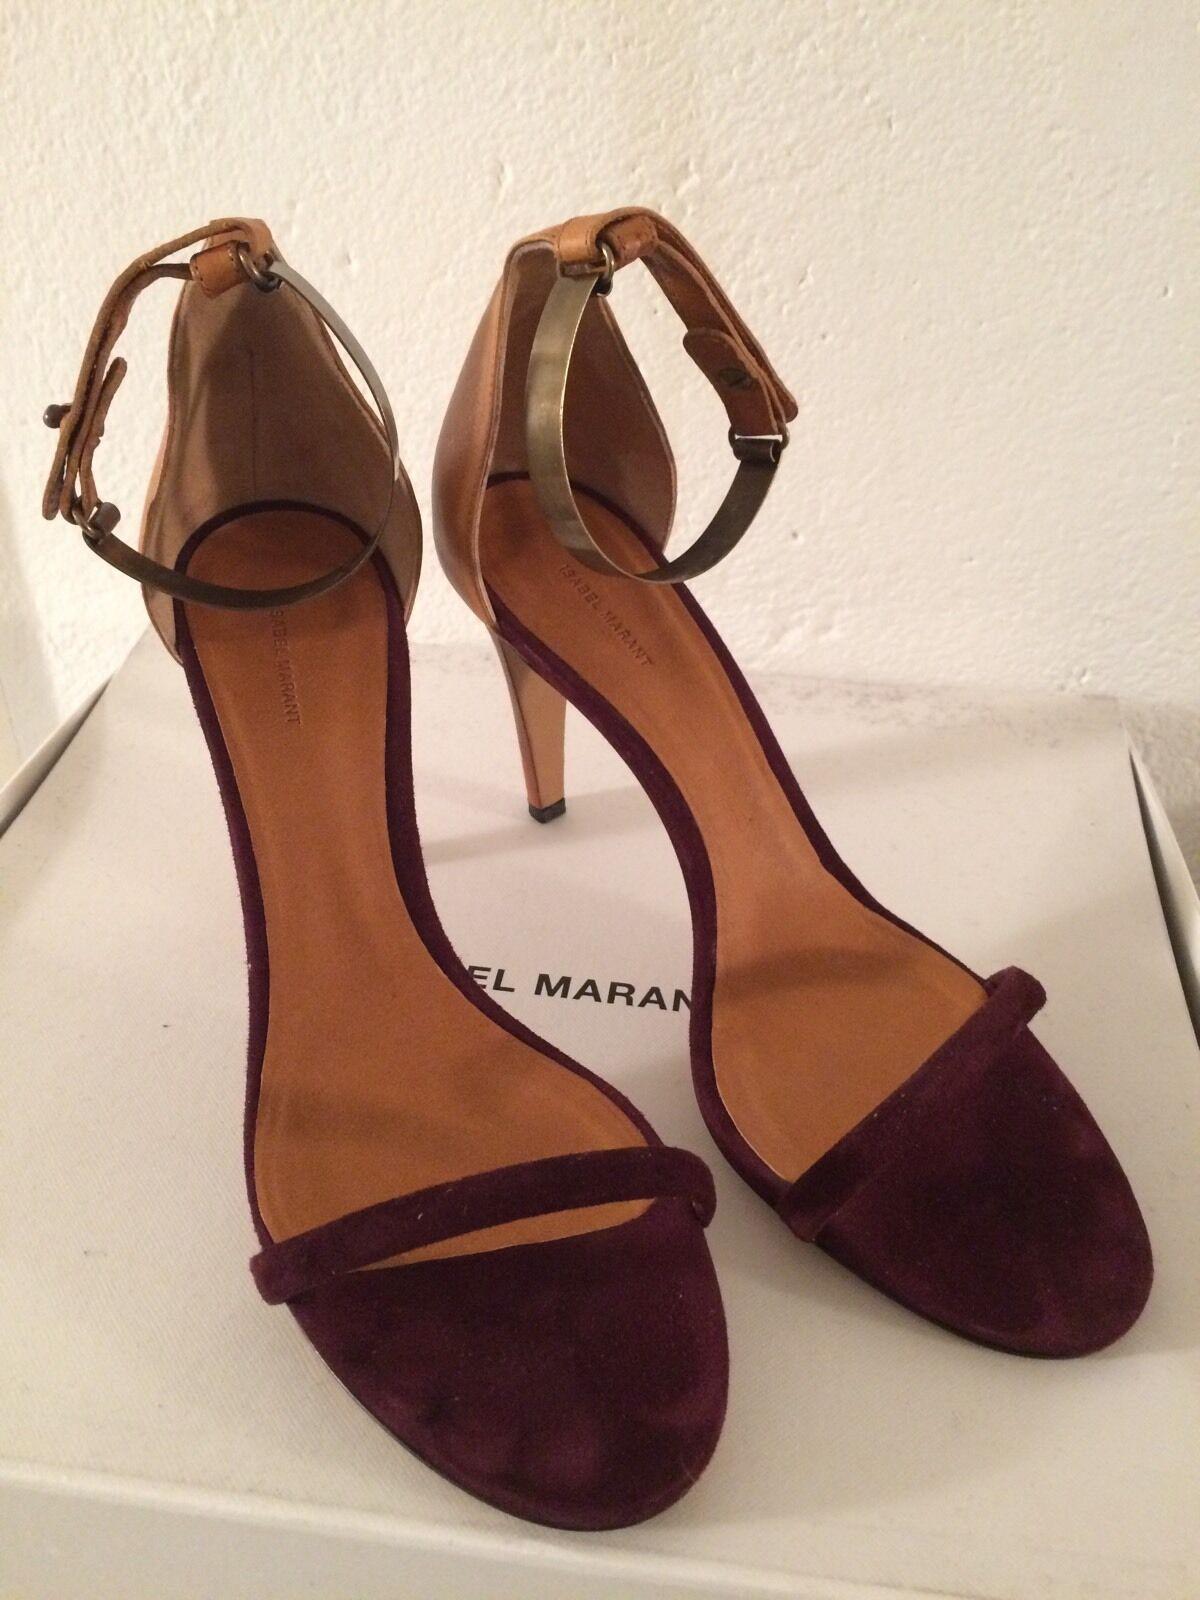 Isabel Marant Marant Marant Sandals, Burgundy , Dimensione 40 5e30cd